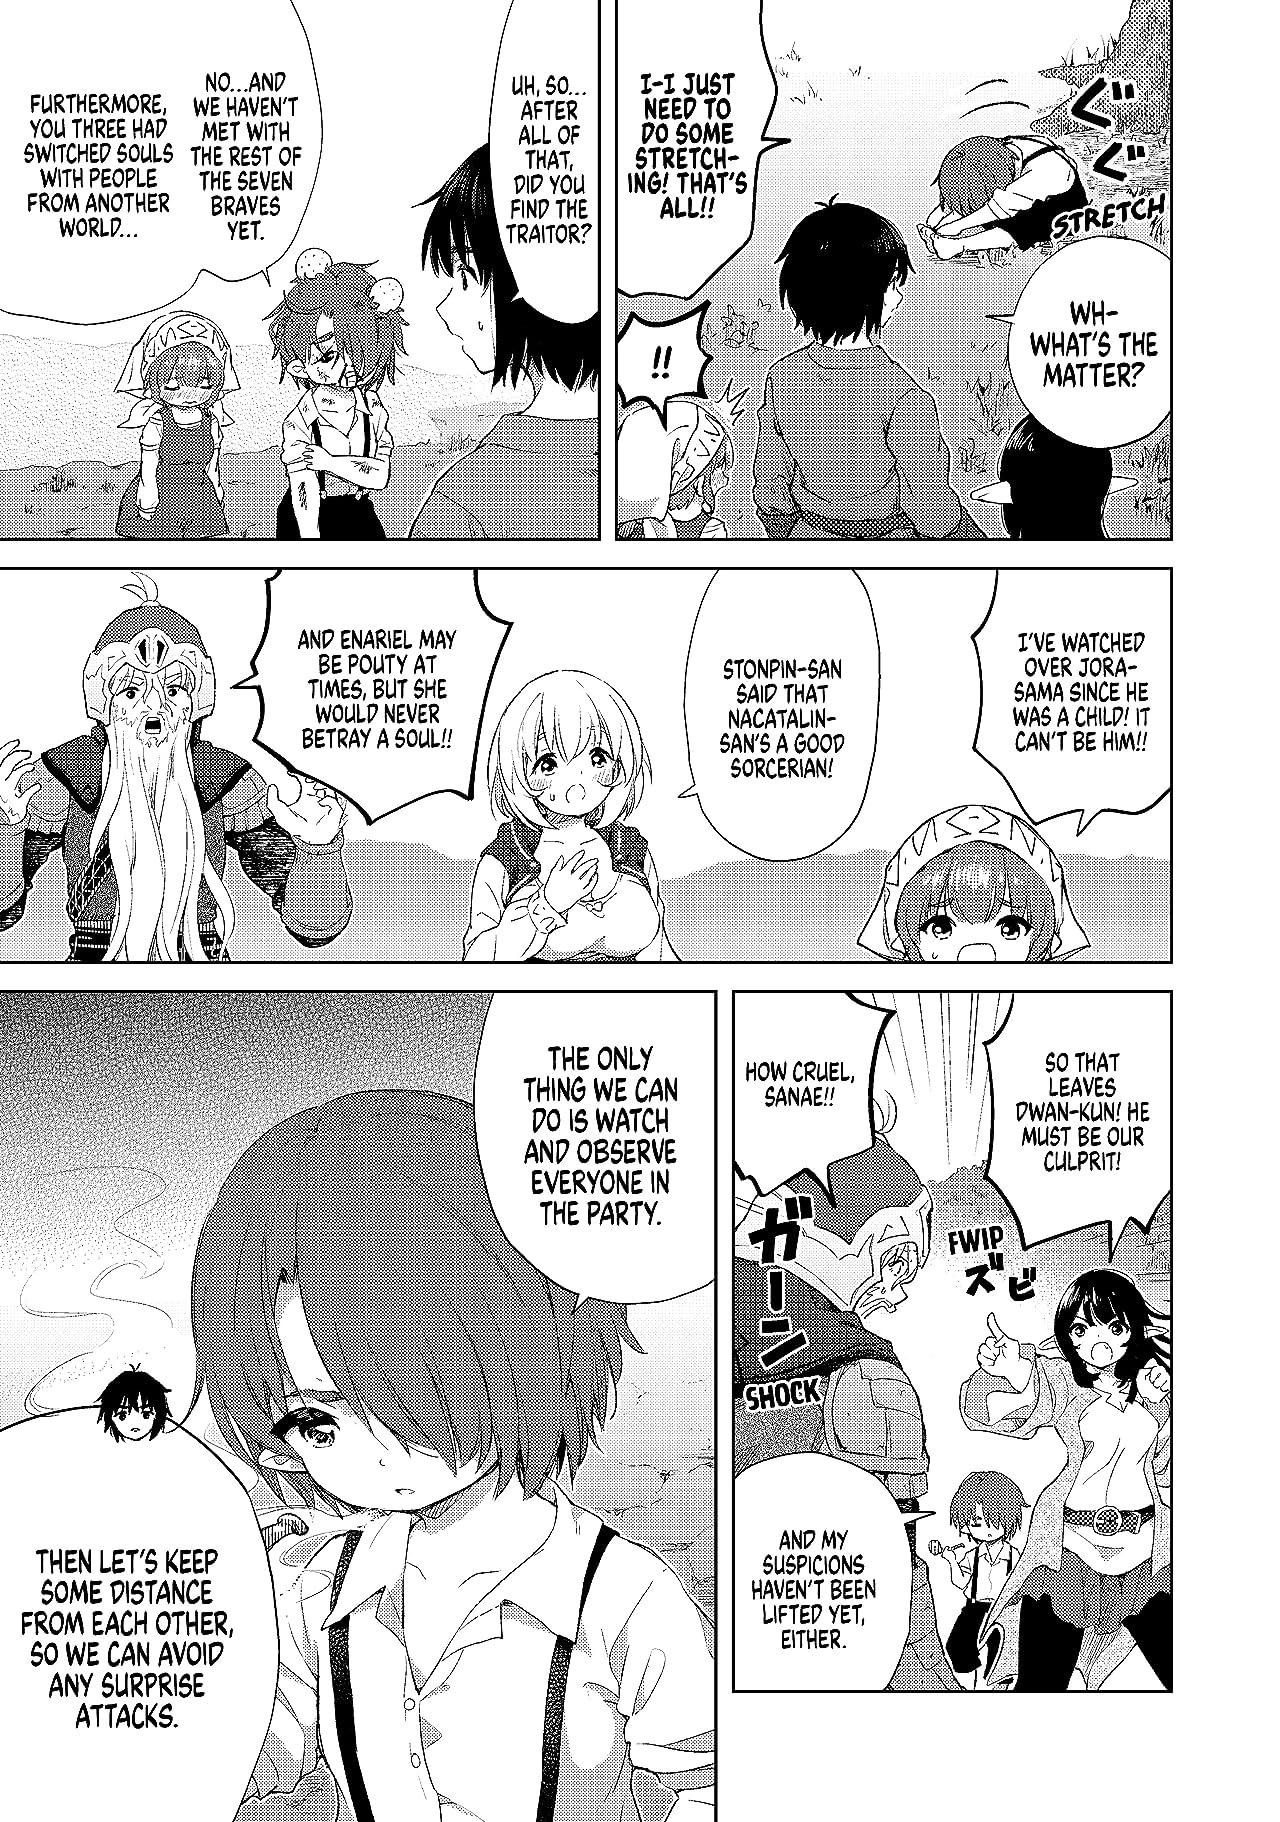 The Invincible Reincarnated Ponkotsu Vol. 5